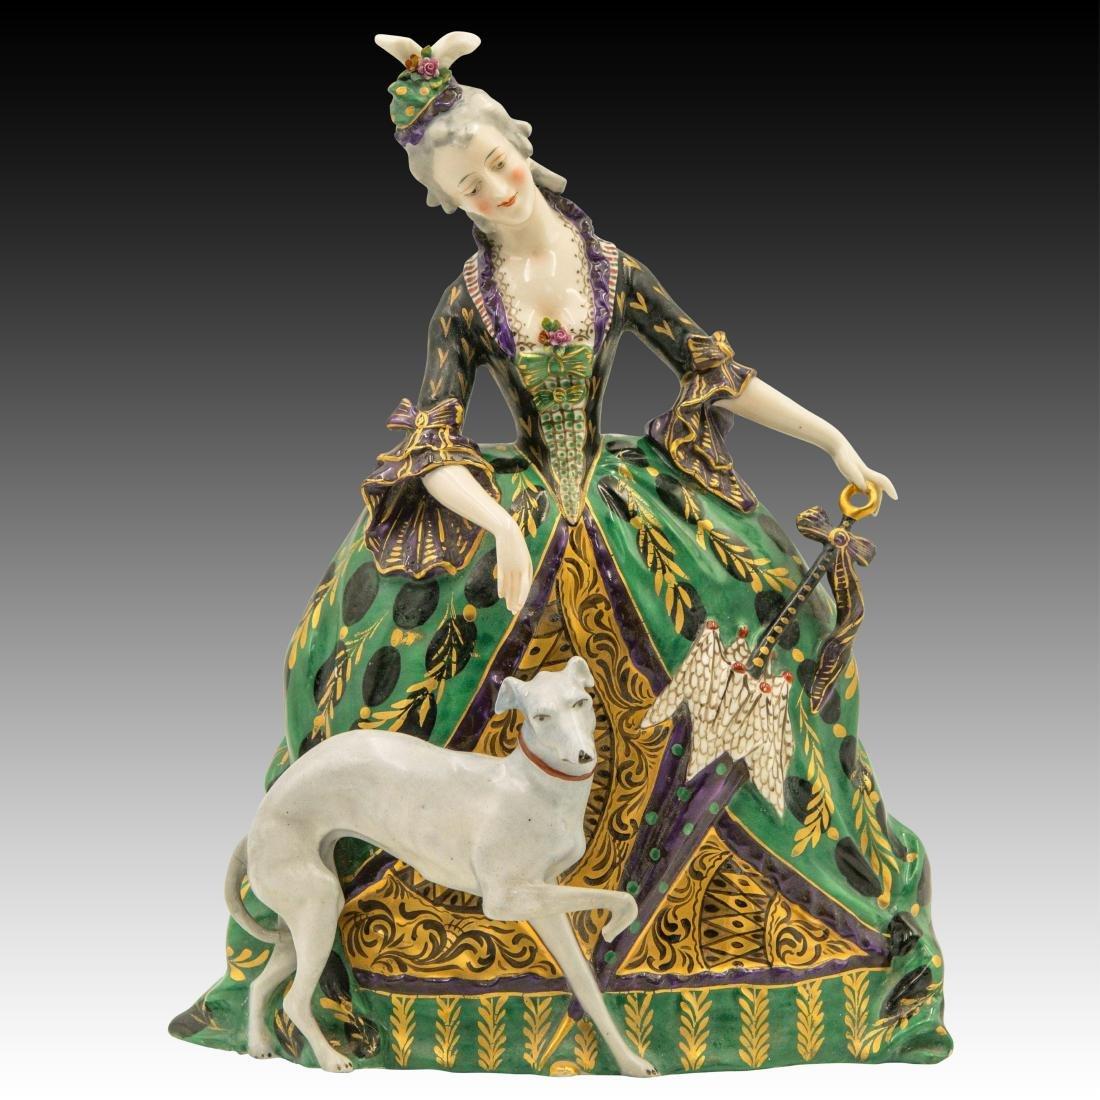 Polychrome Figurine Woman and her Greyhound